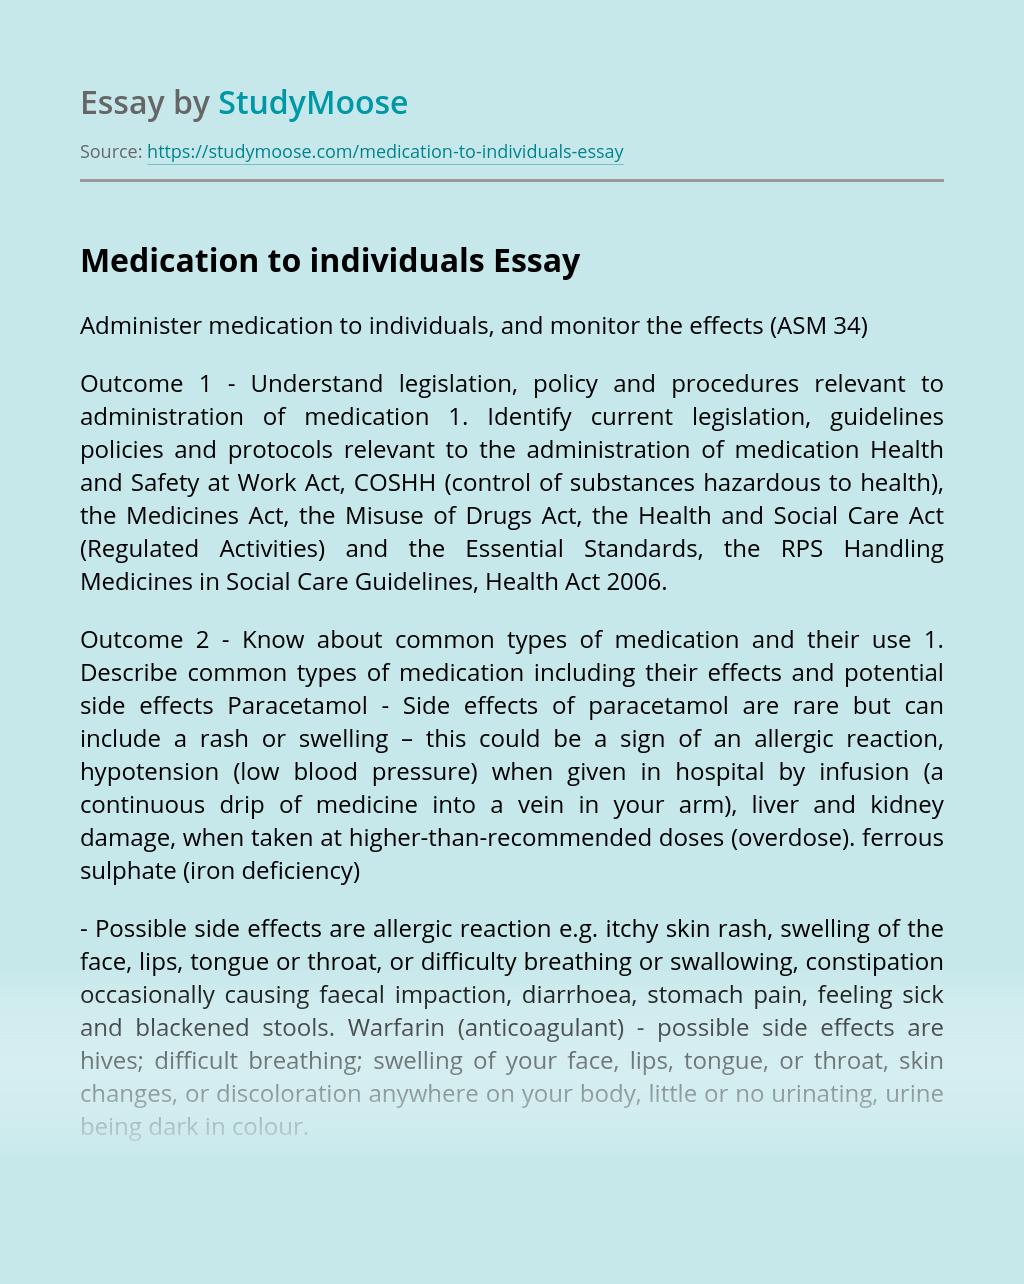 Medication to individuals